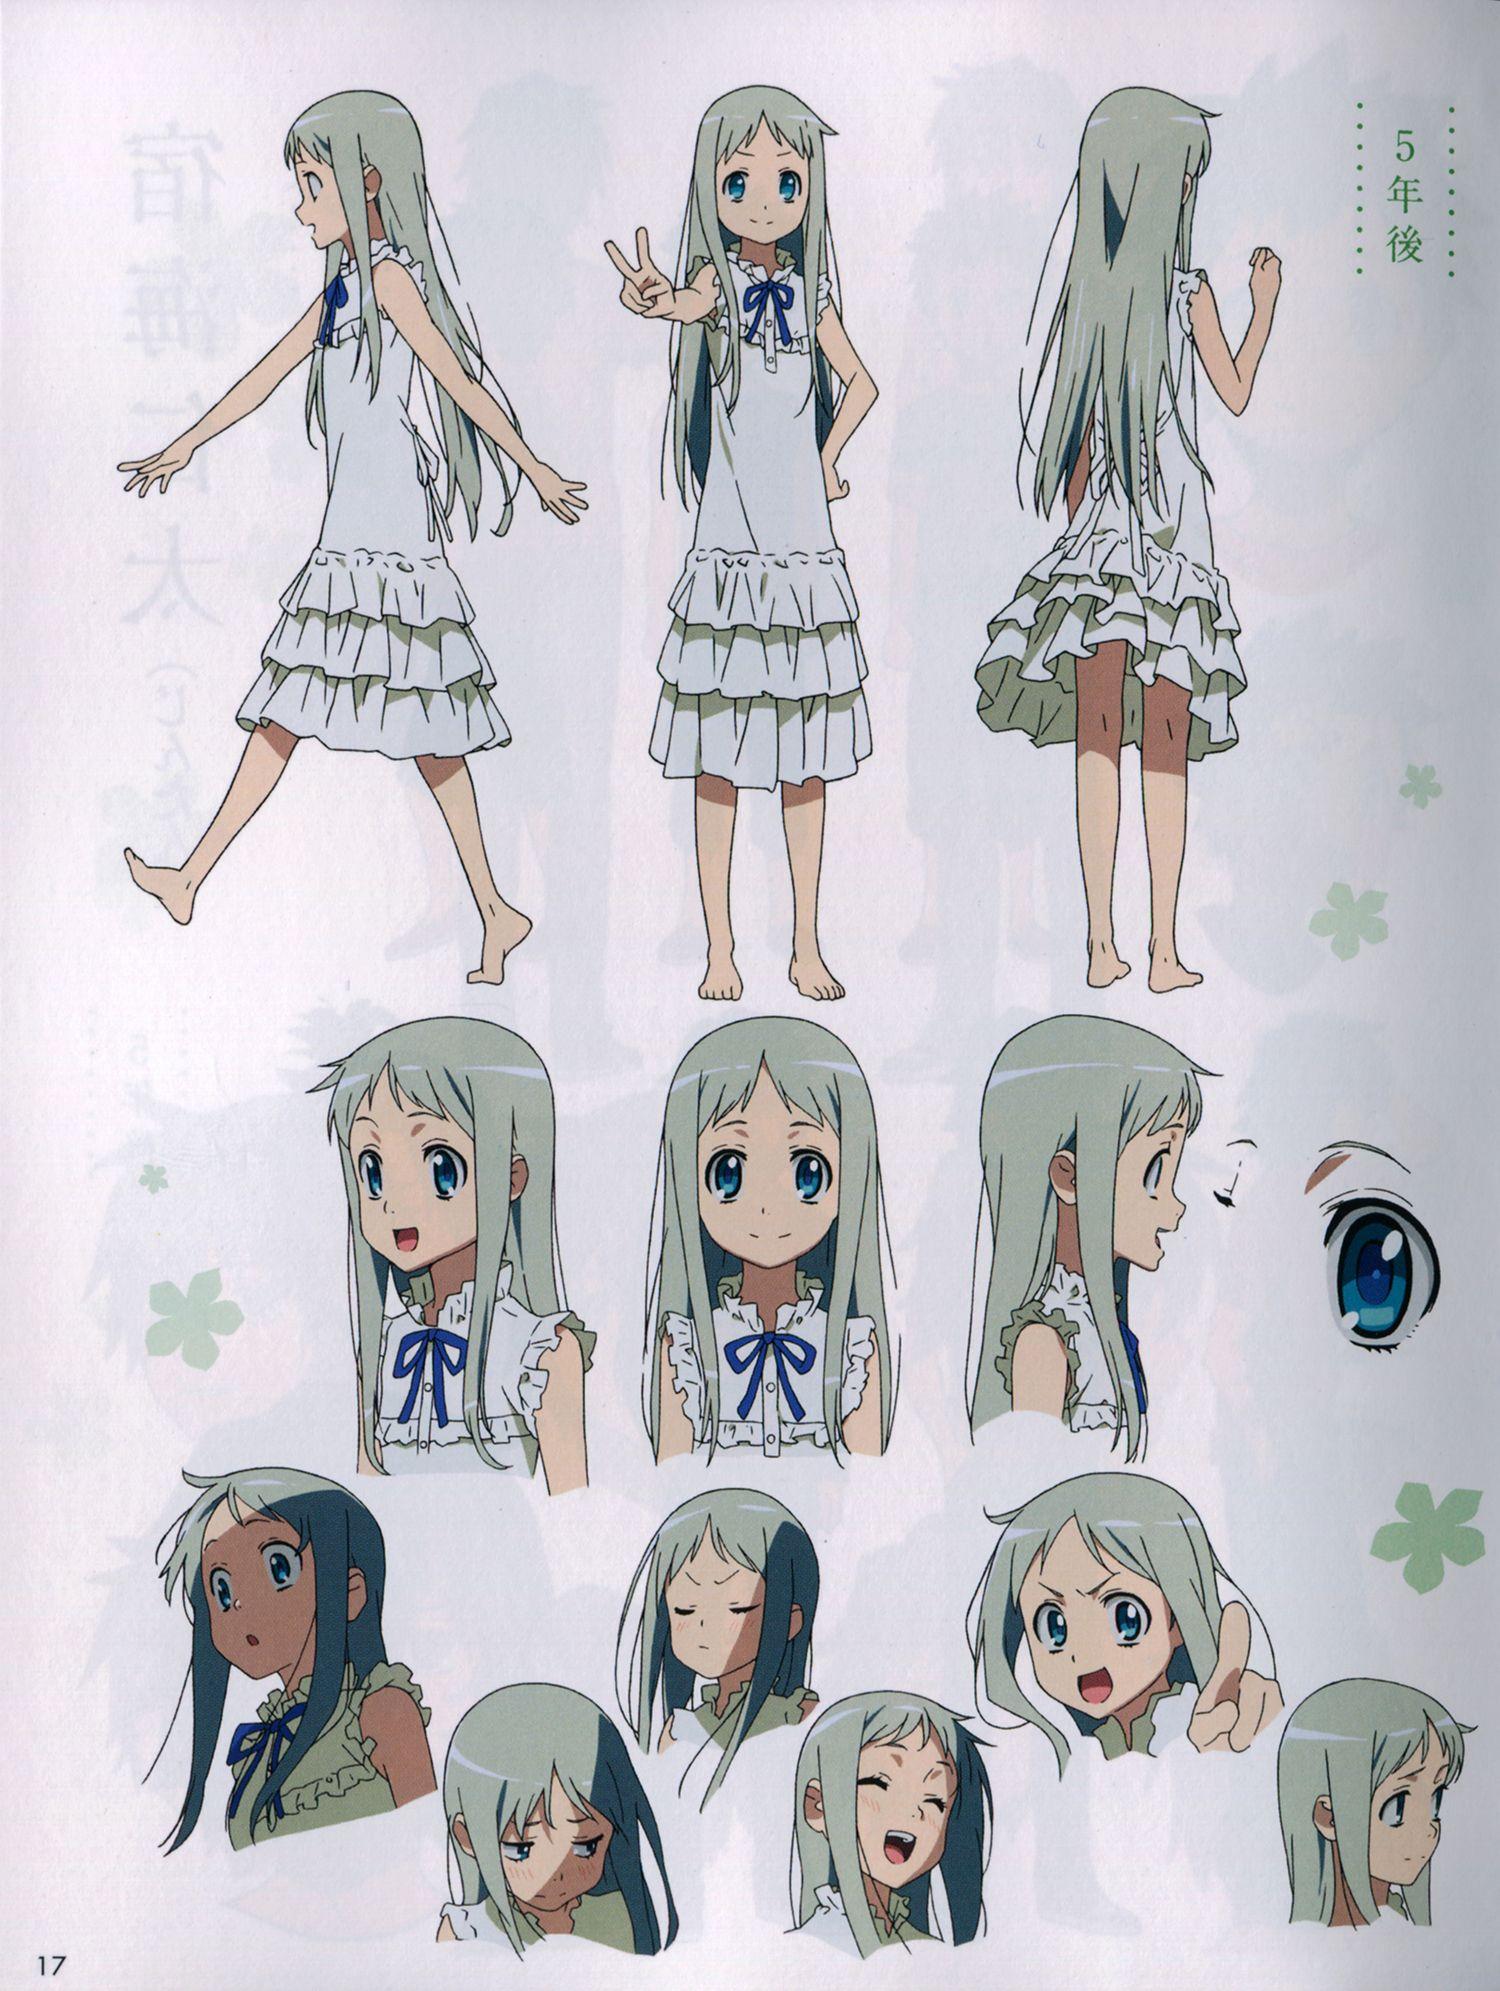 anohana character design Menma teenage キャラクターデザイン, 田中将賀